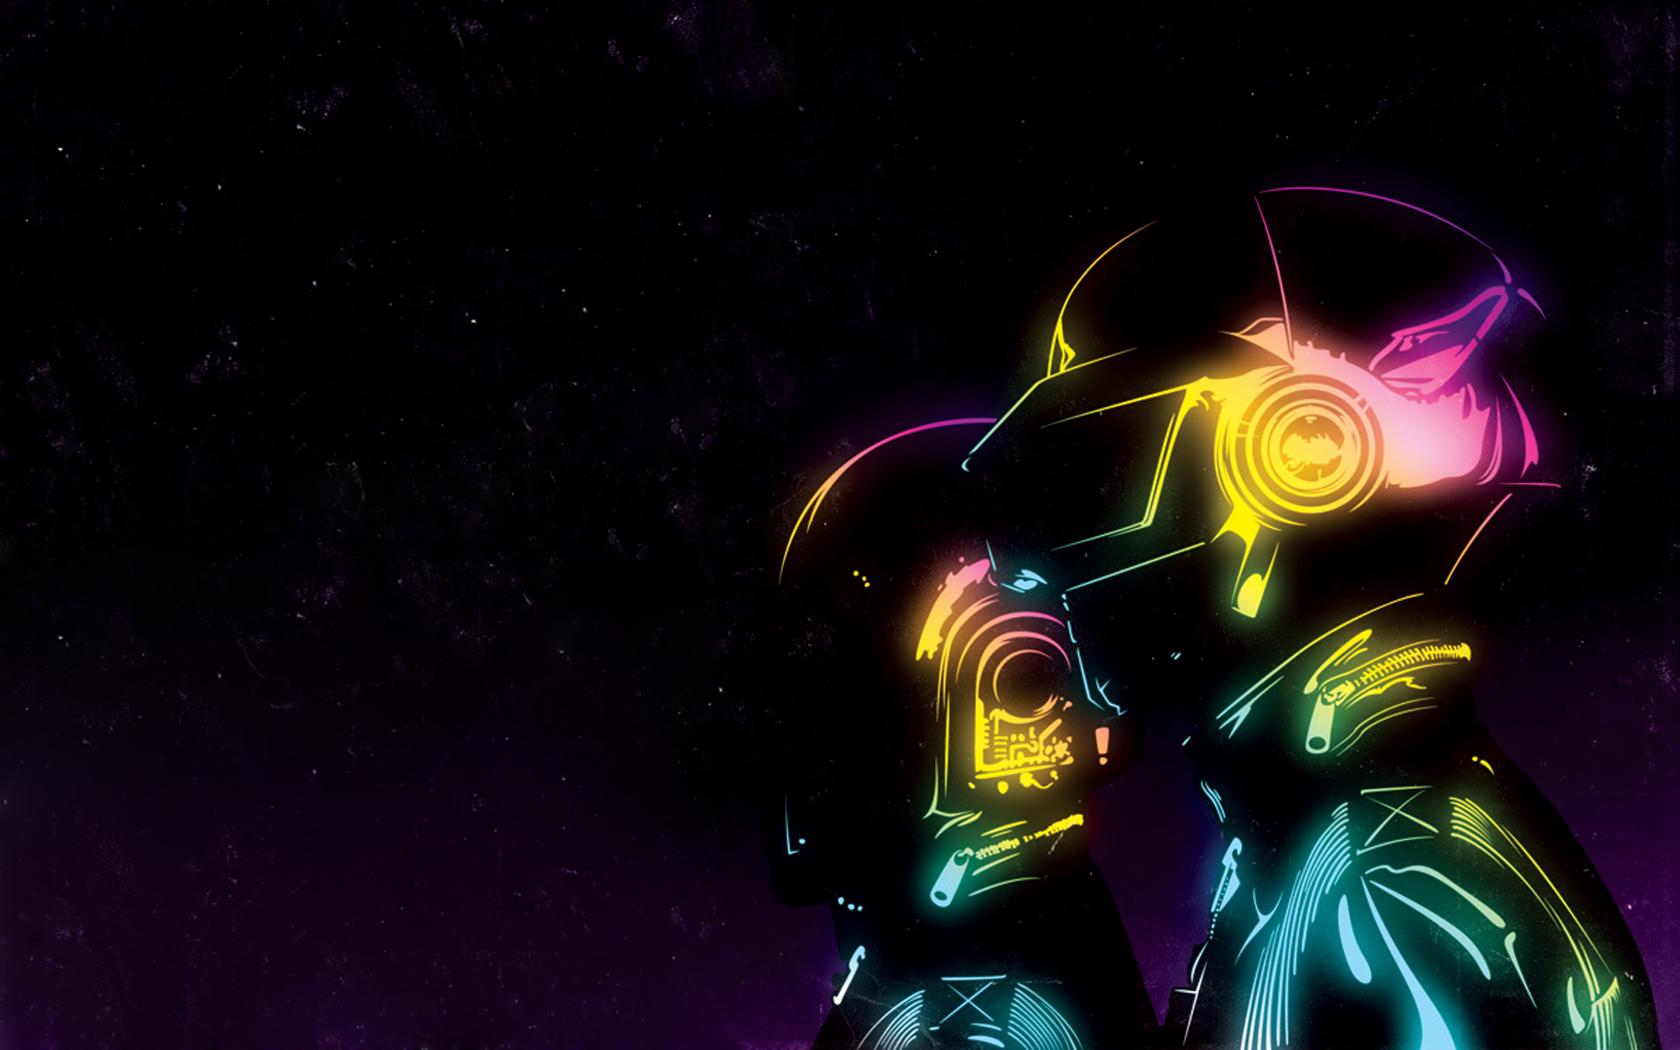 1000+ images about I love Daft Punk on Pinterest | Revolutions